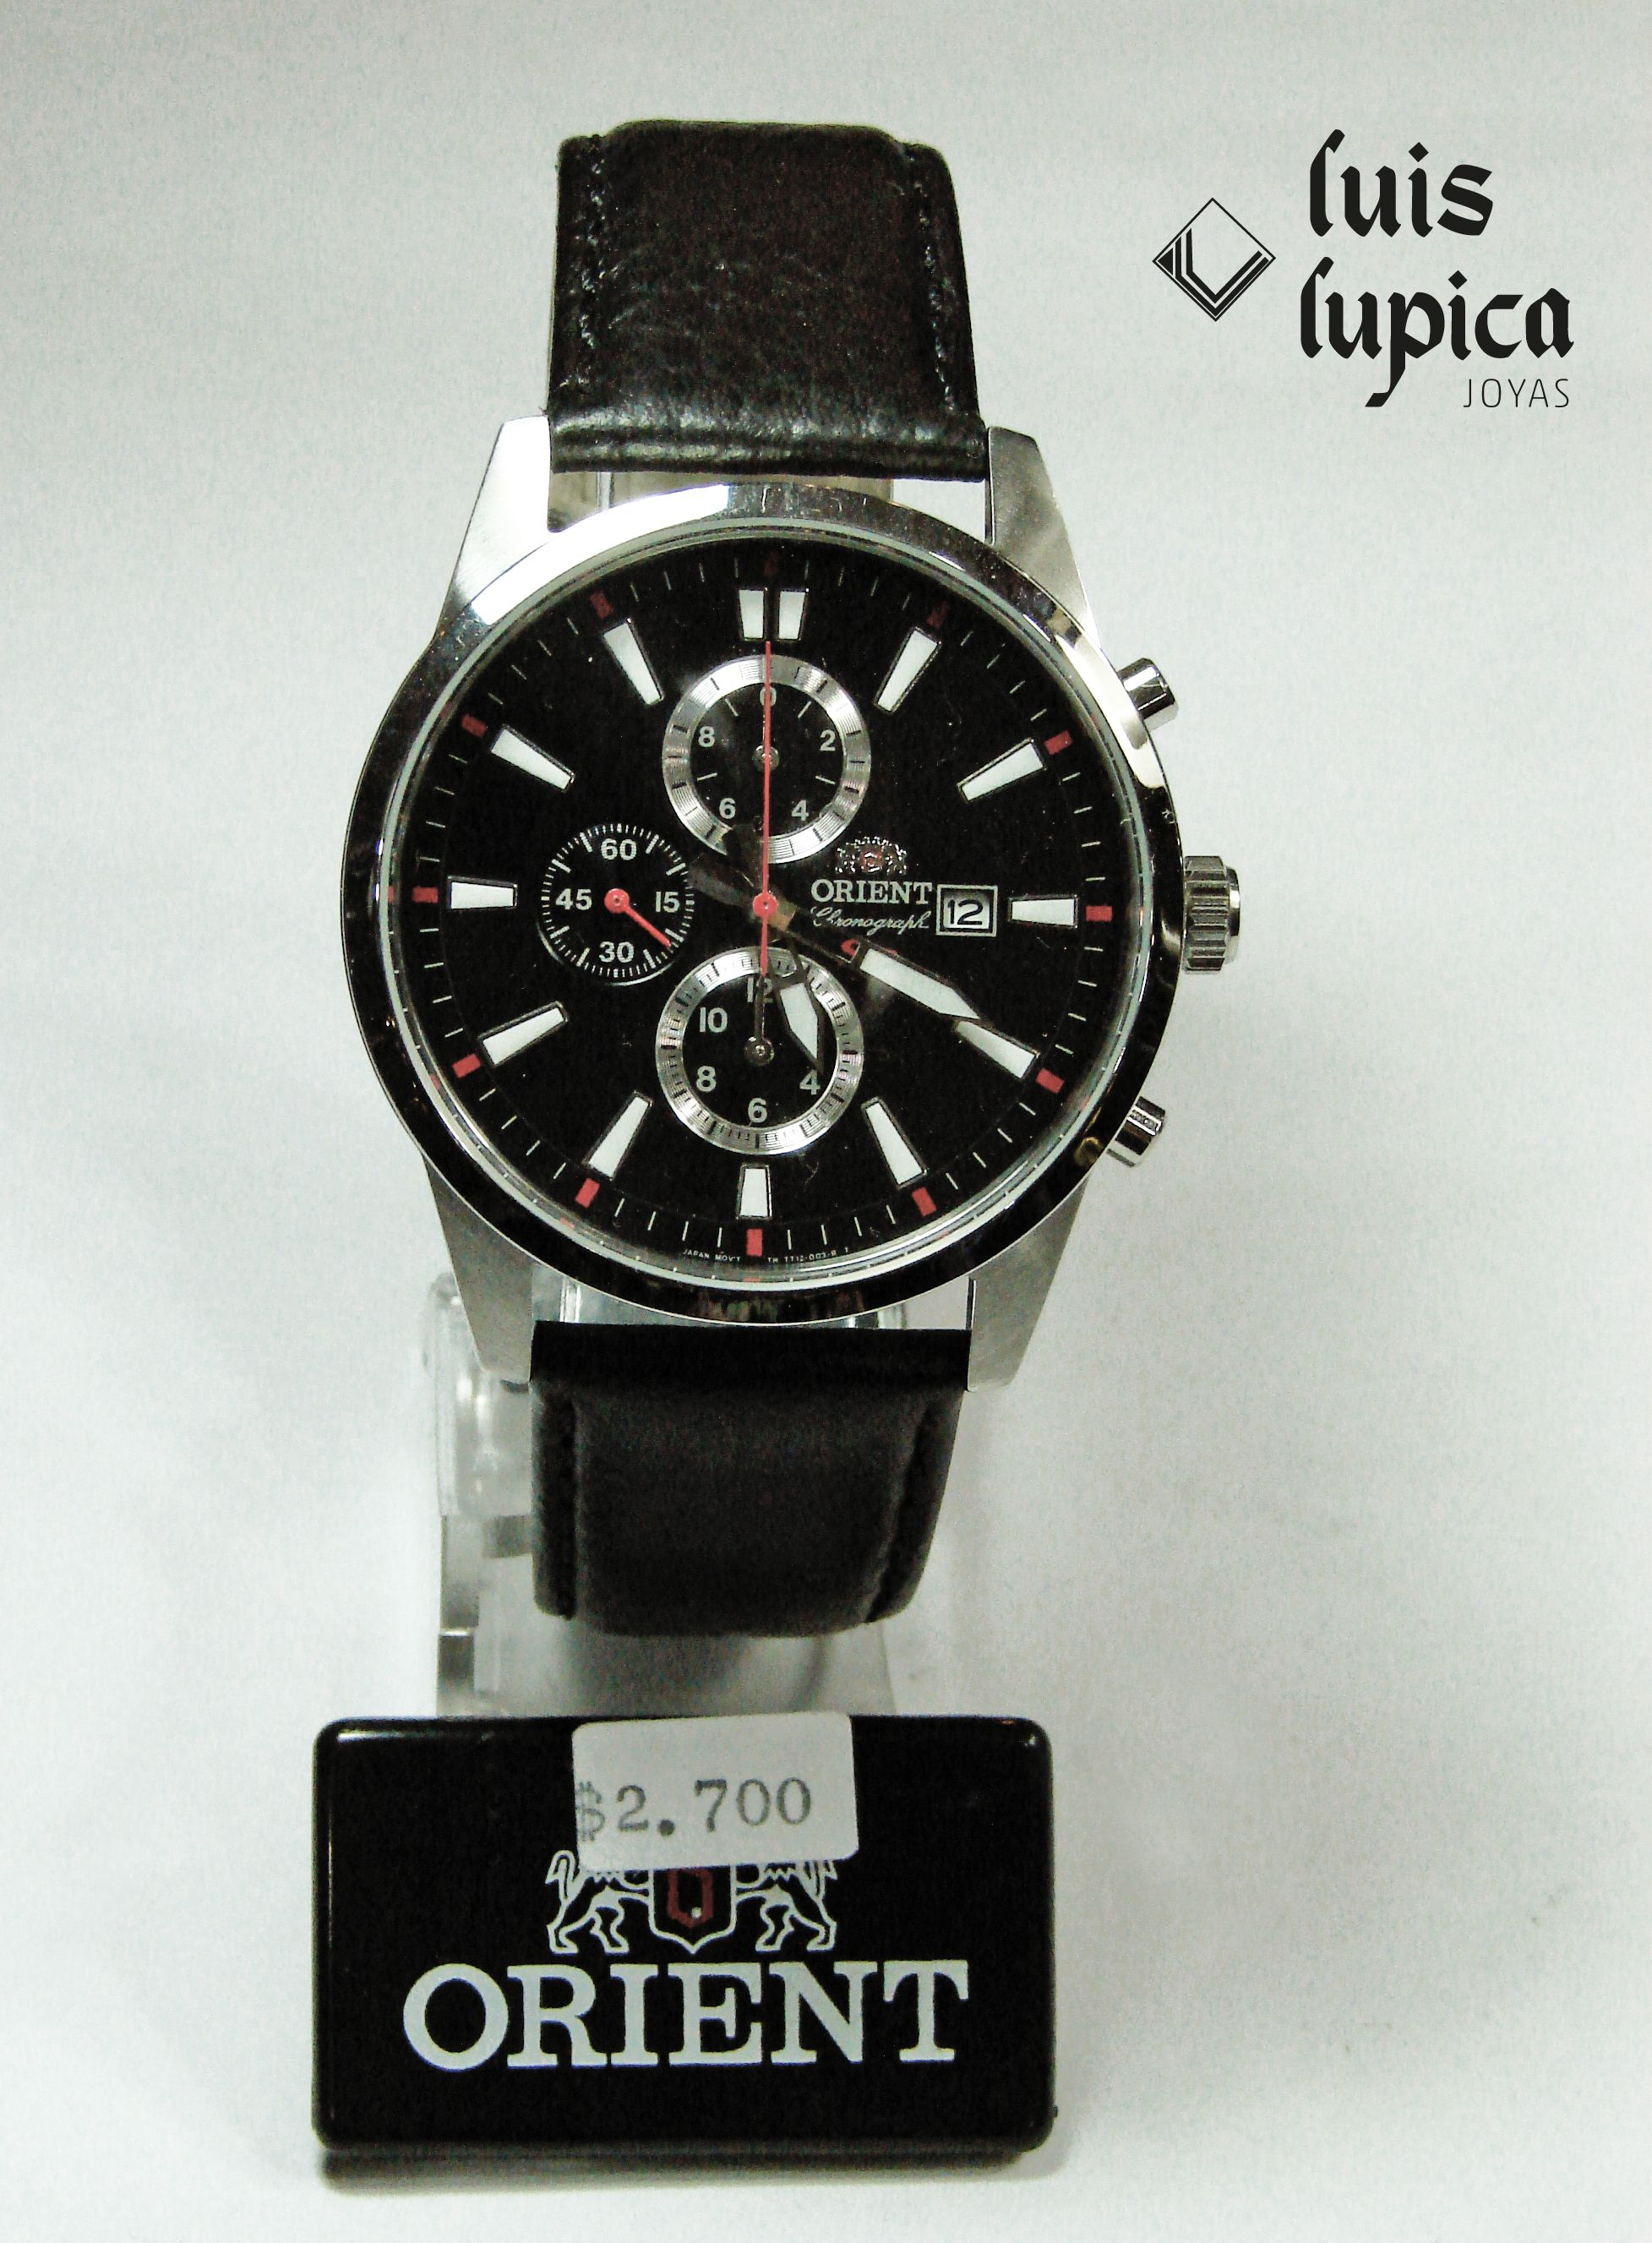 Reloj Orient. Adquirilo en Local Comercial calle  TUCUMÁN 51 ... 28672a8afdfb